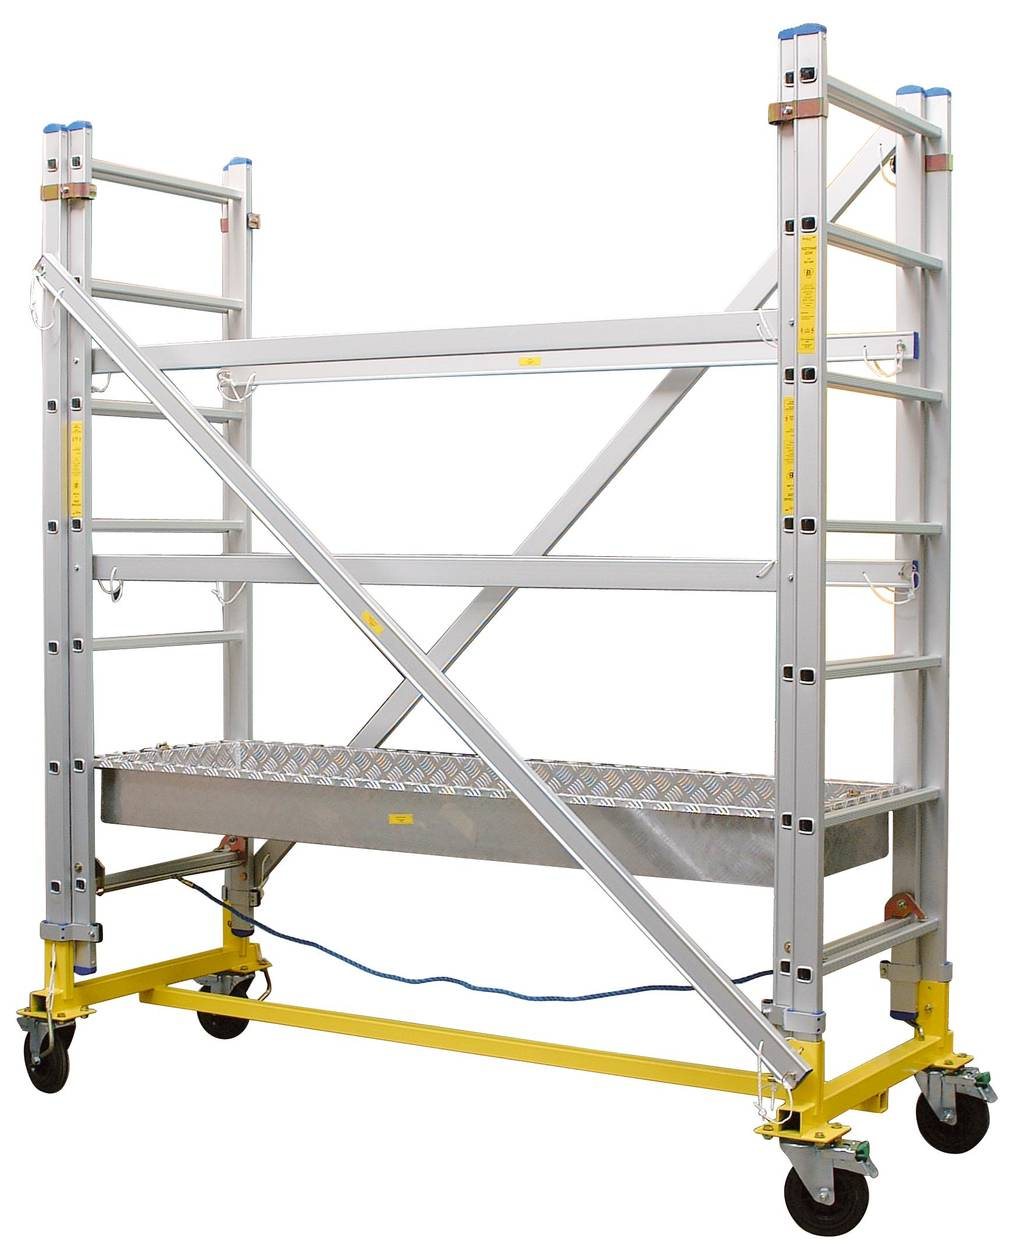 4 Aluminum Rolling Scaffold : Aluminum scaffold rj impiger pl